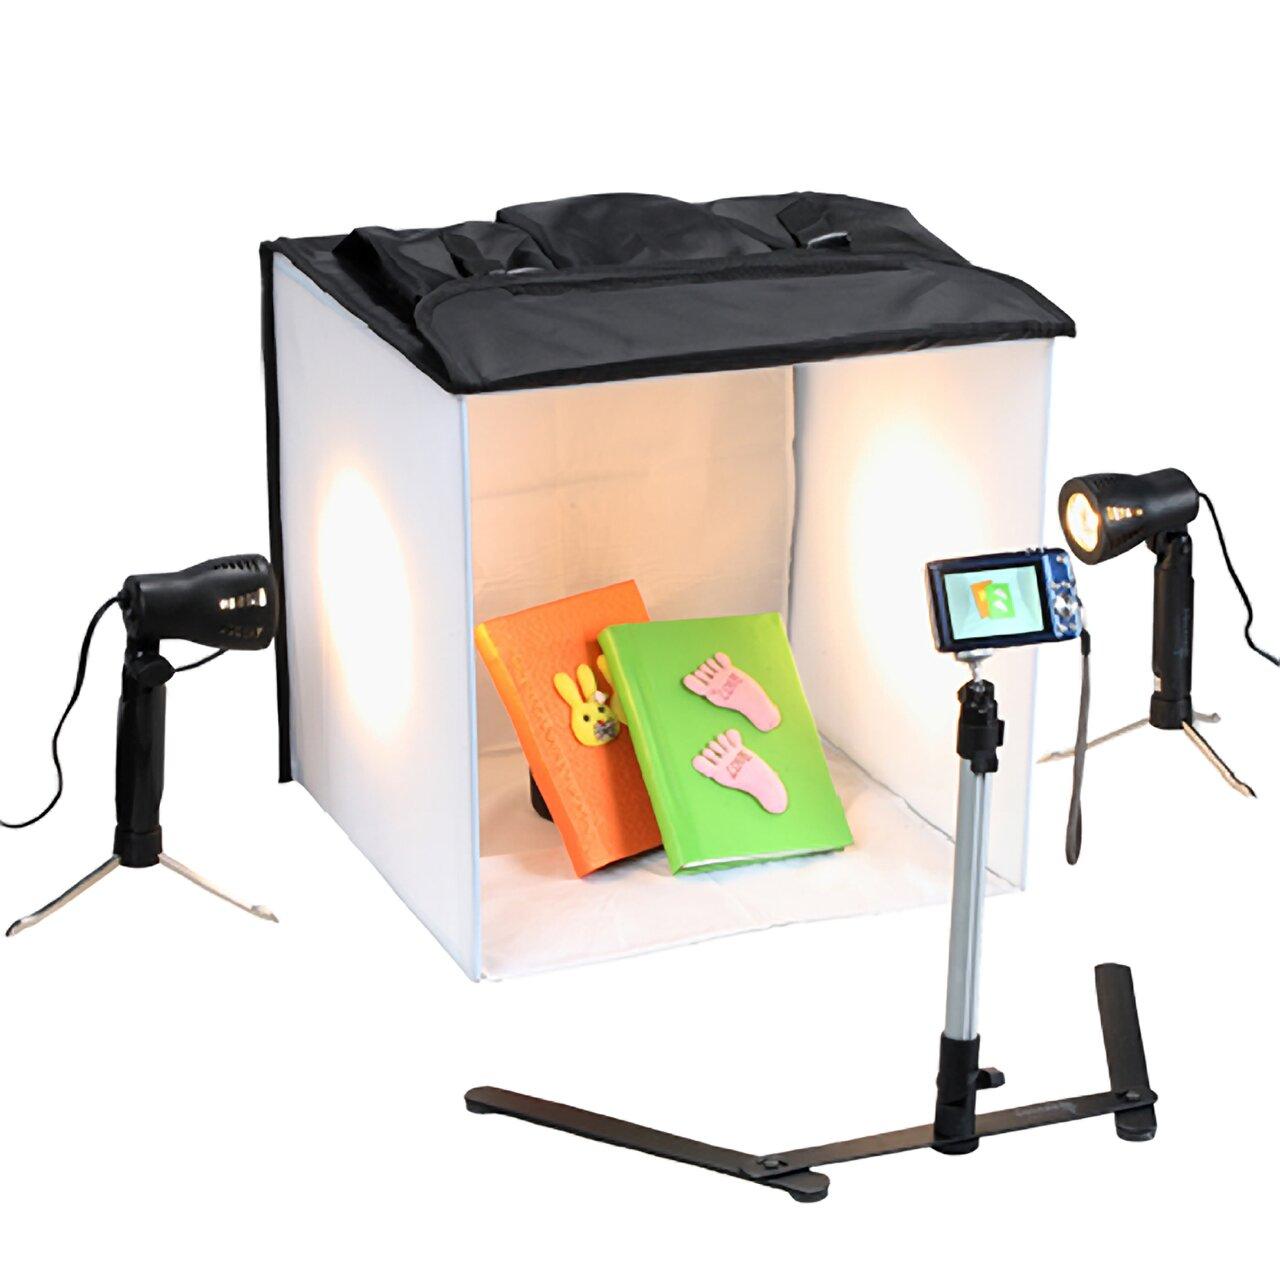 Studio Lighting Box: Square Perfect Studio In Box Light Tent Cube & Reviews